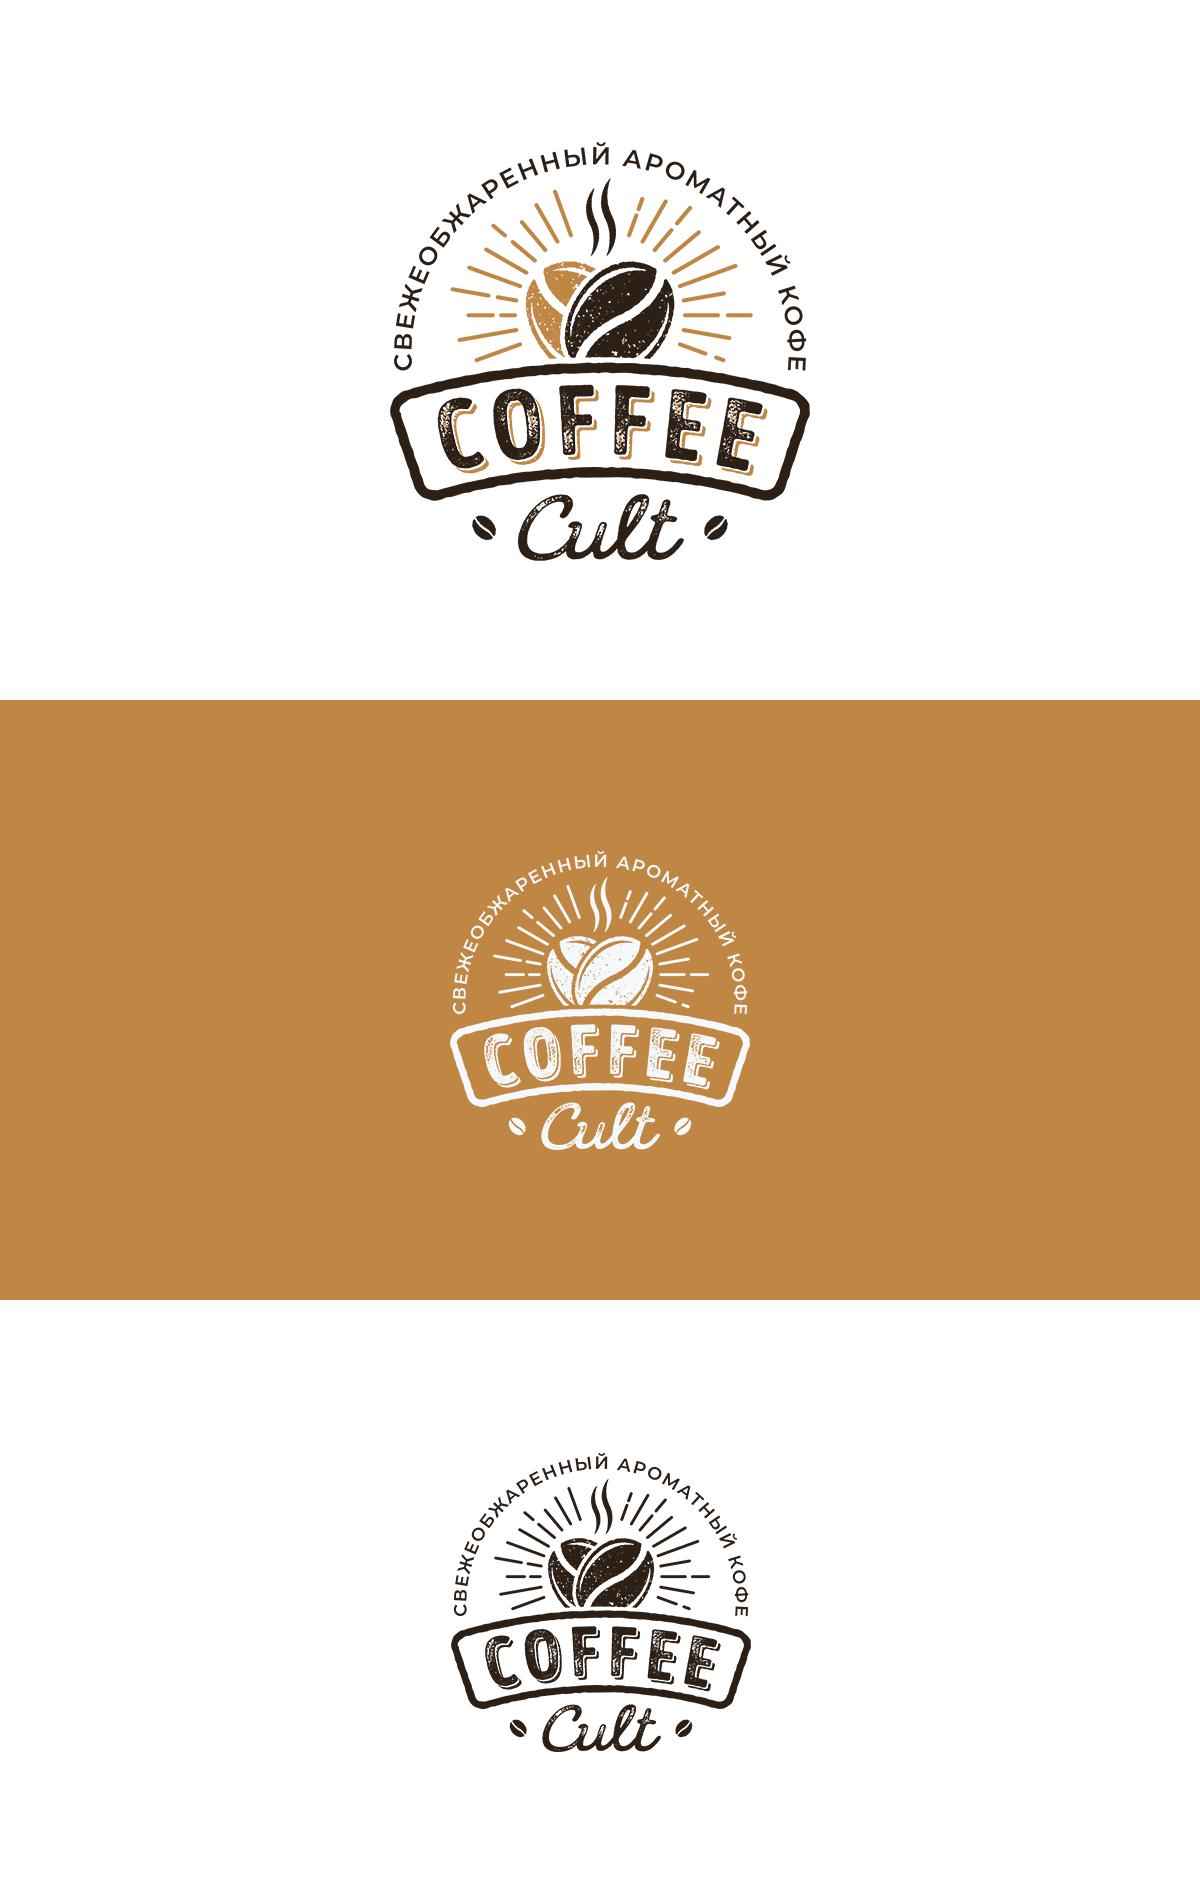 Логотип и фирменный стиль для компании COFFEE CULT фото f_9555bc9a0b0bbcb0.png